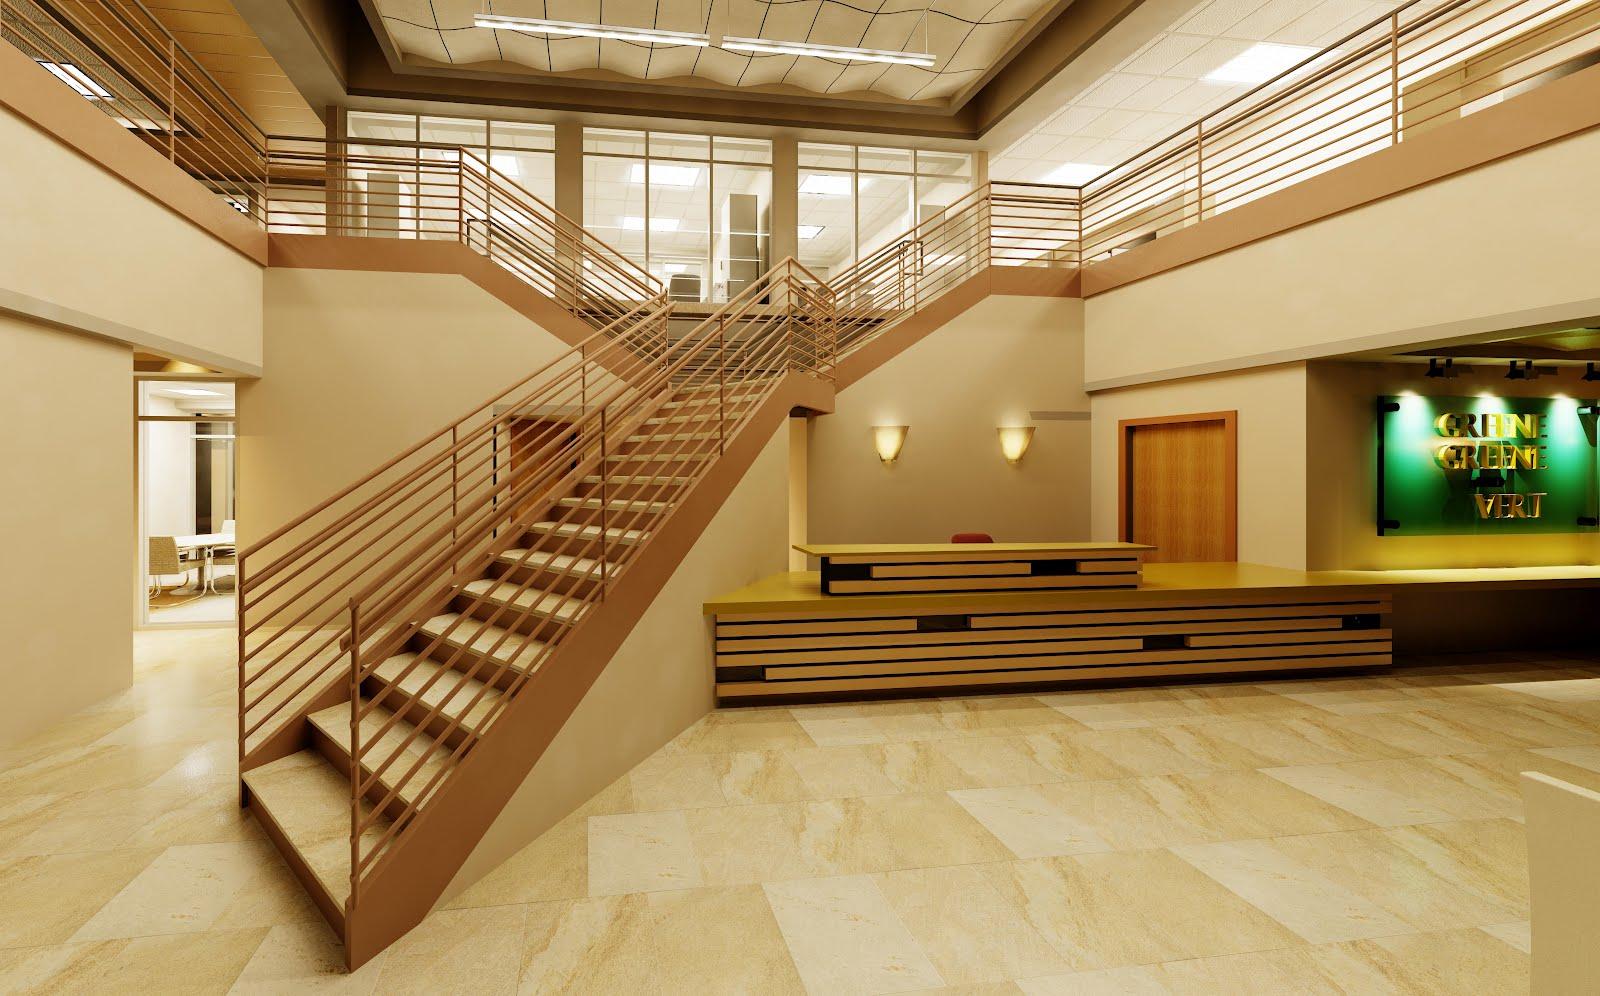 Stair Railing Designs Interior   Joy Studio Design Gallery ...